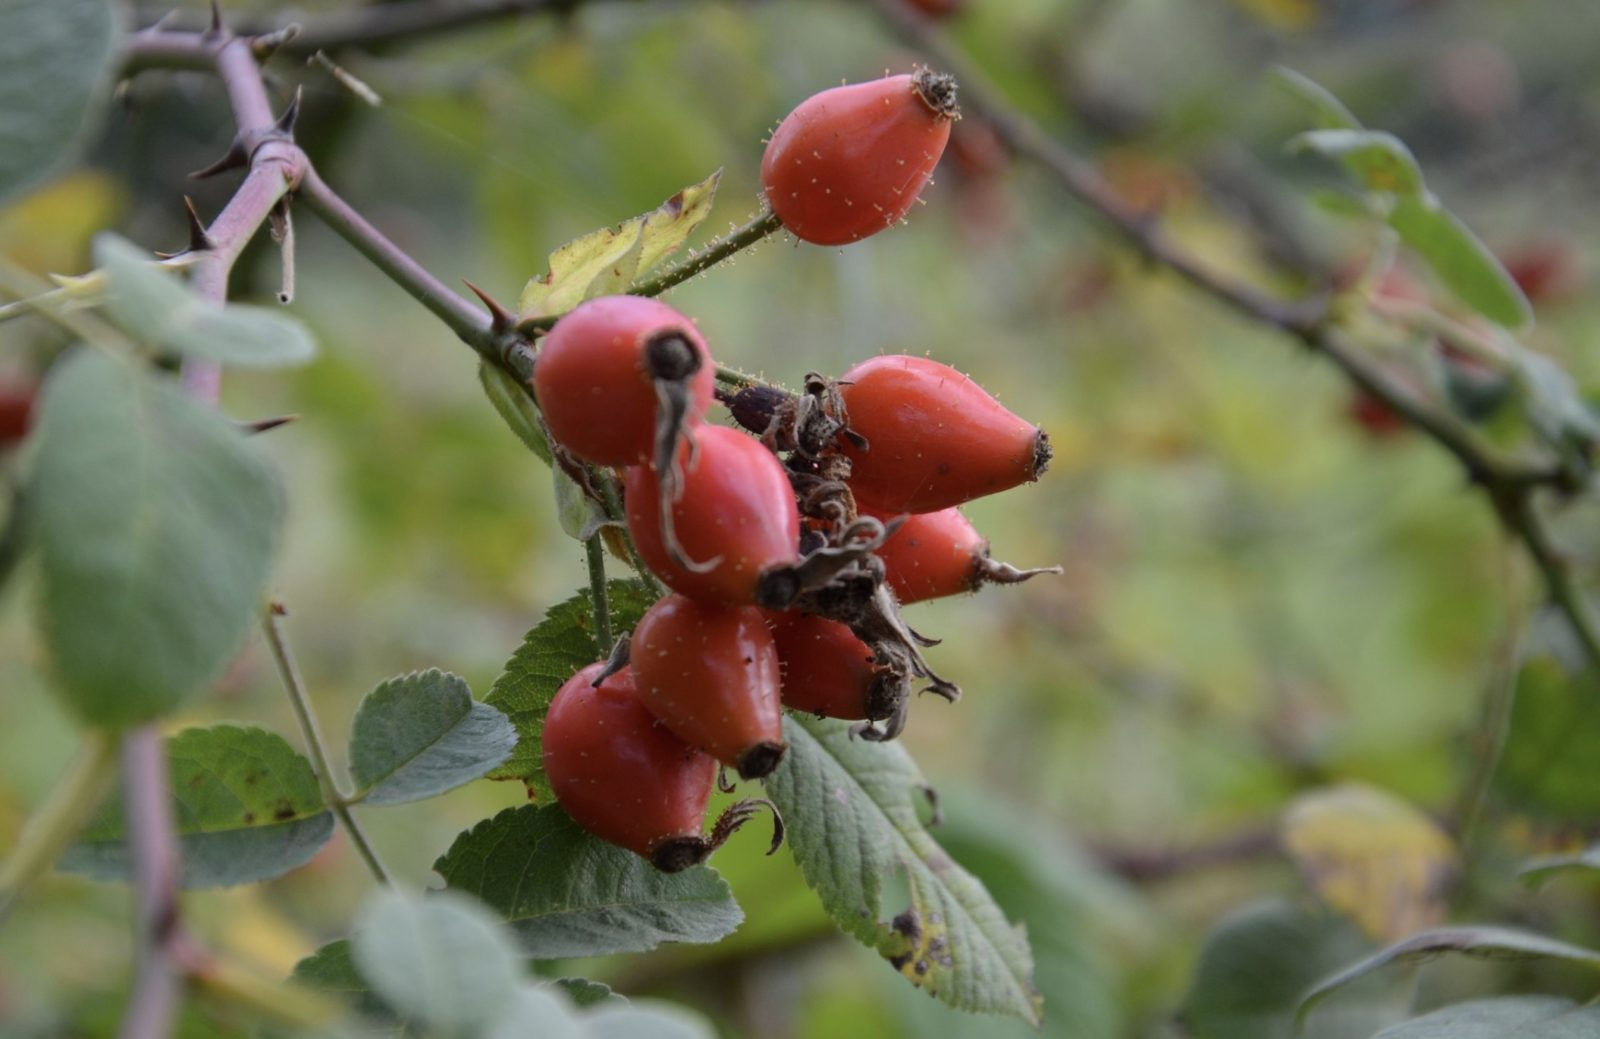 les cynorhodons, fruits de l'églantier